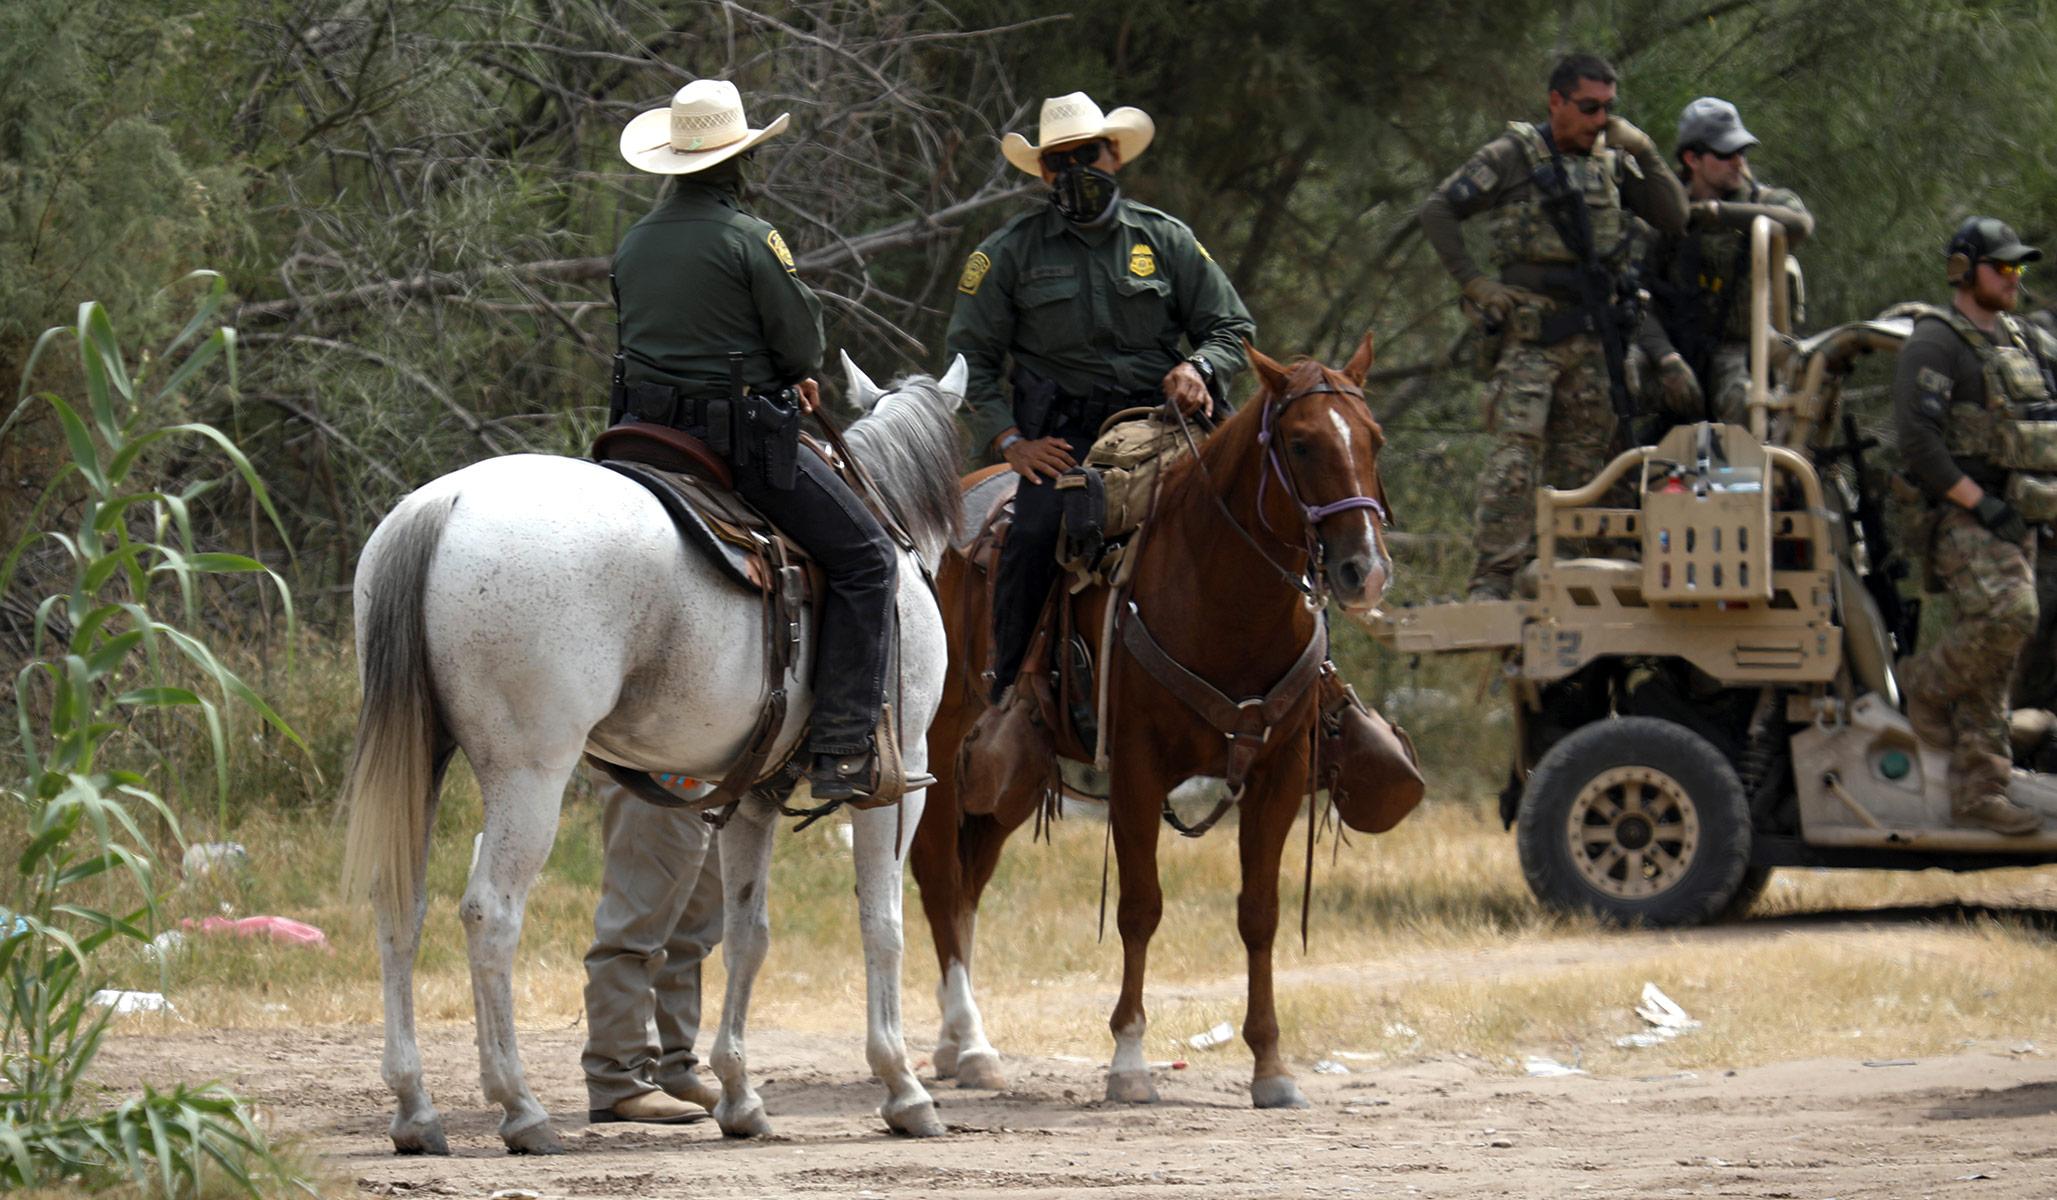 Psaki Announces Del Rio Border Patrol Will No Longer Use Horses in Response to False 'Whip' Narrative